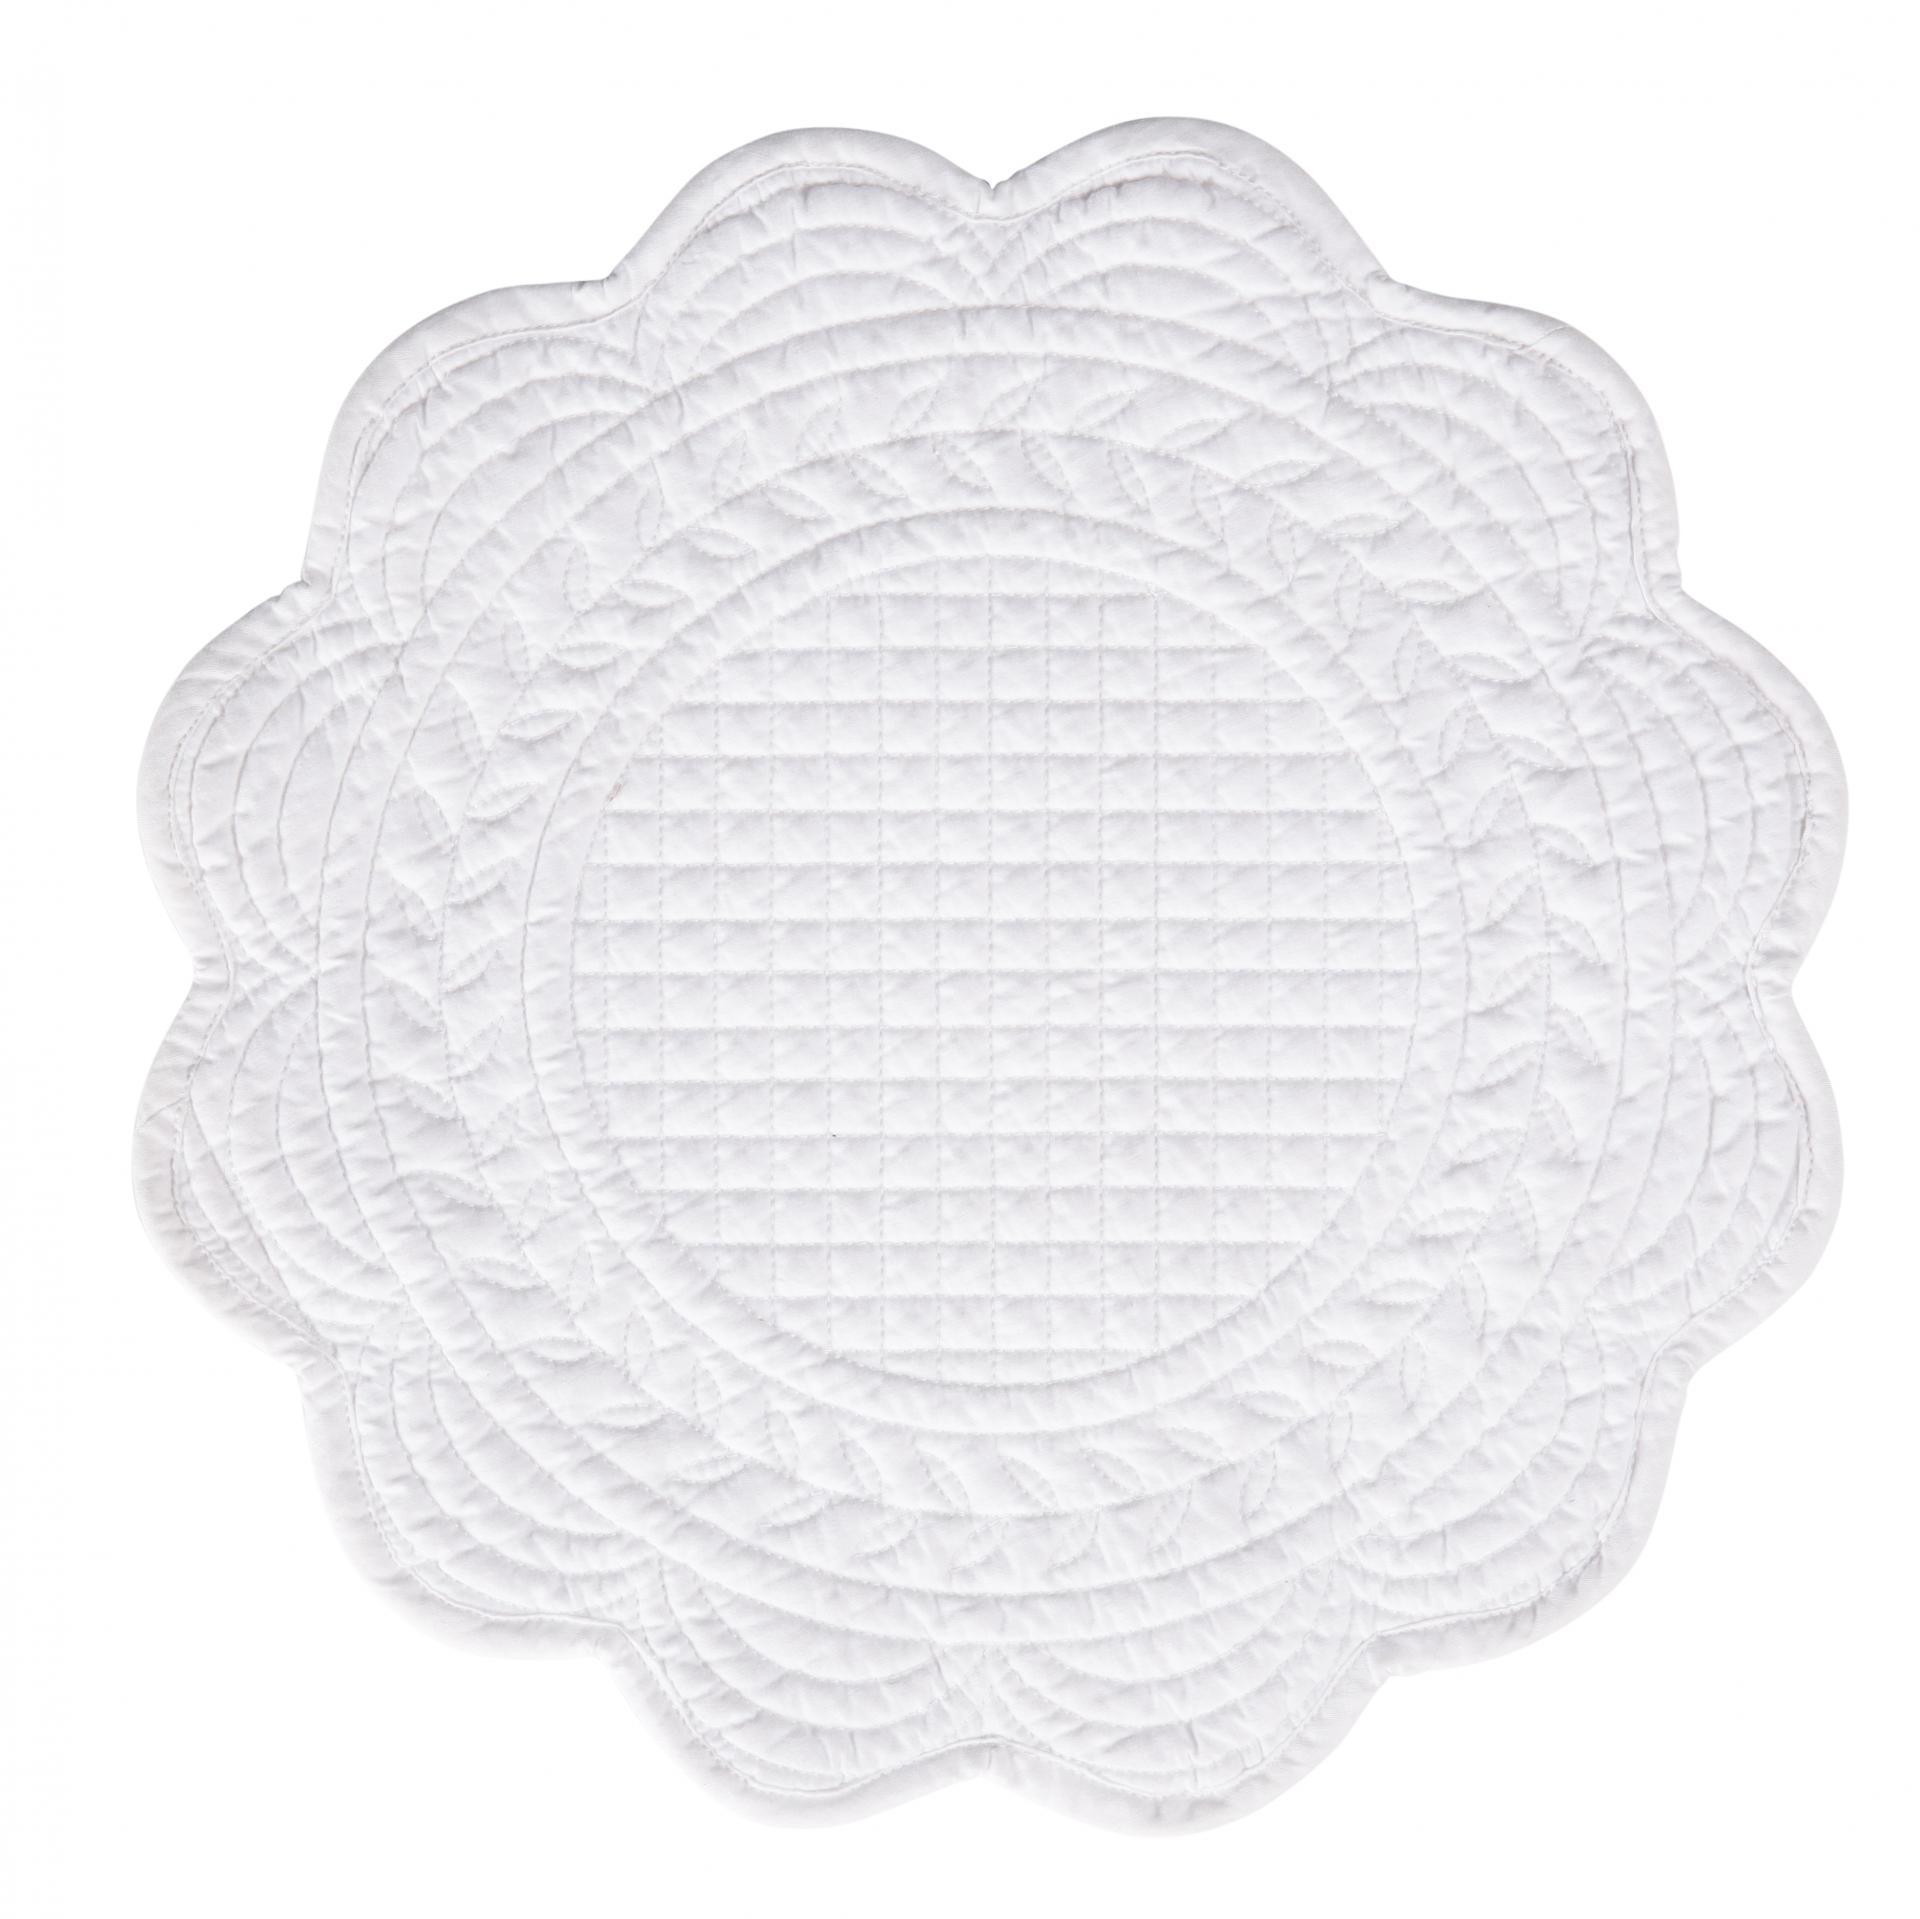 CÔTÉ TABLE Prošívané prostírání Blanc 40cm, bílá barva, textil